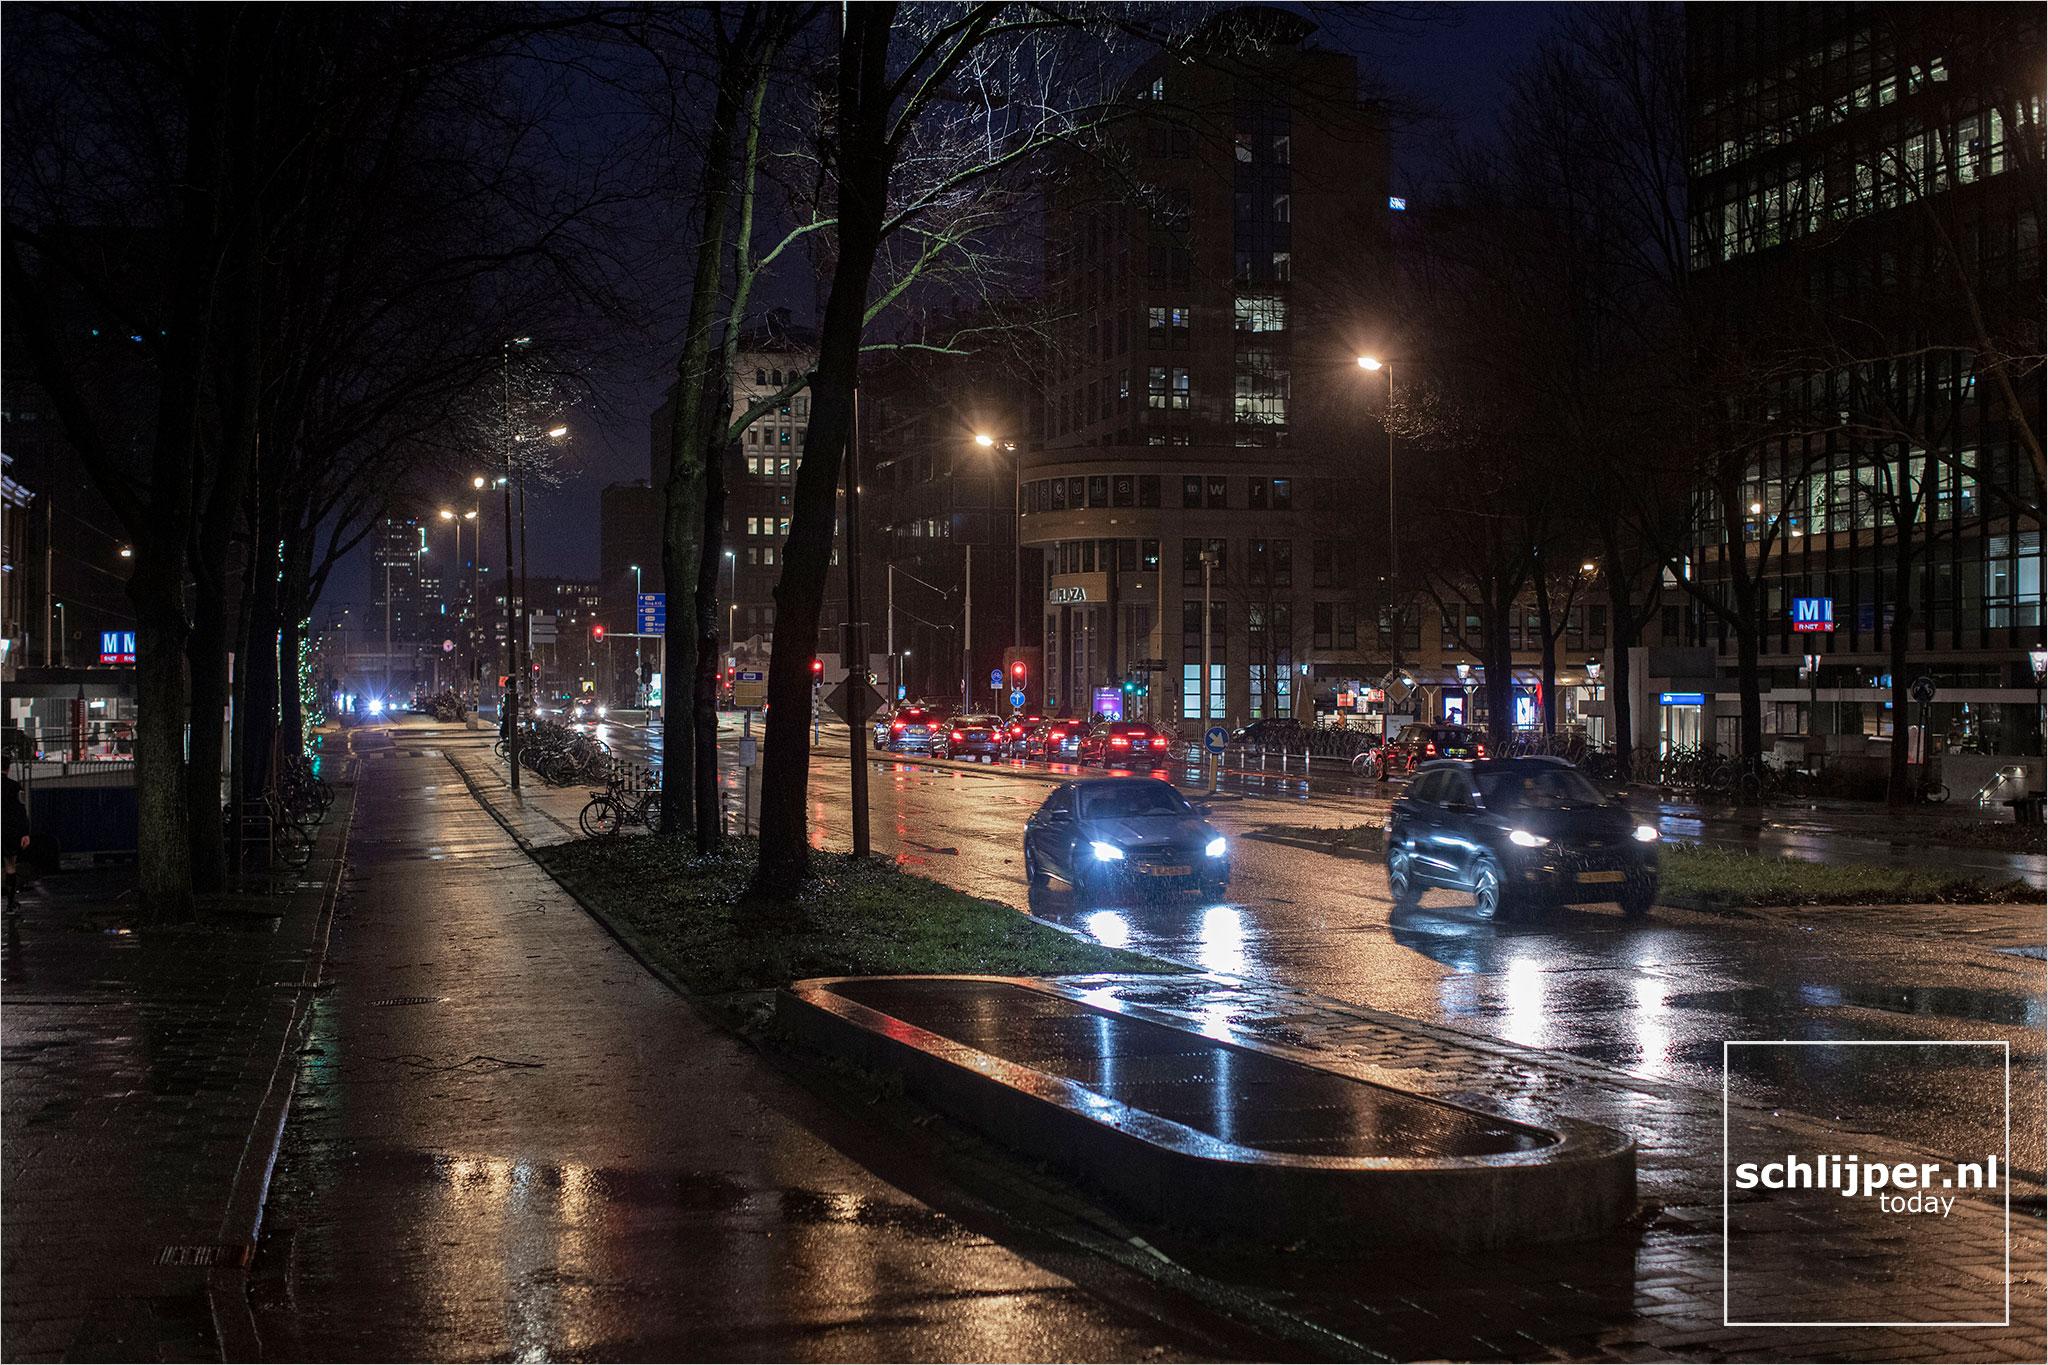 The Netherlands, Amsterdam, 27 december 2020